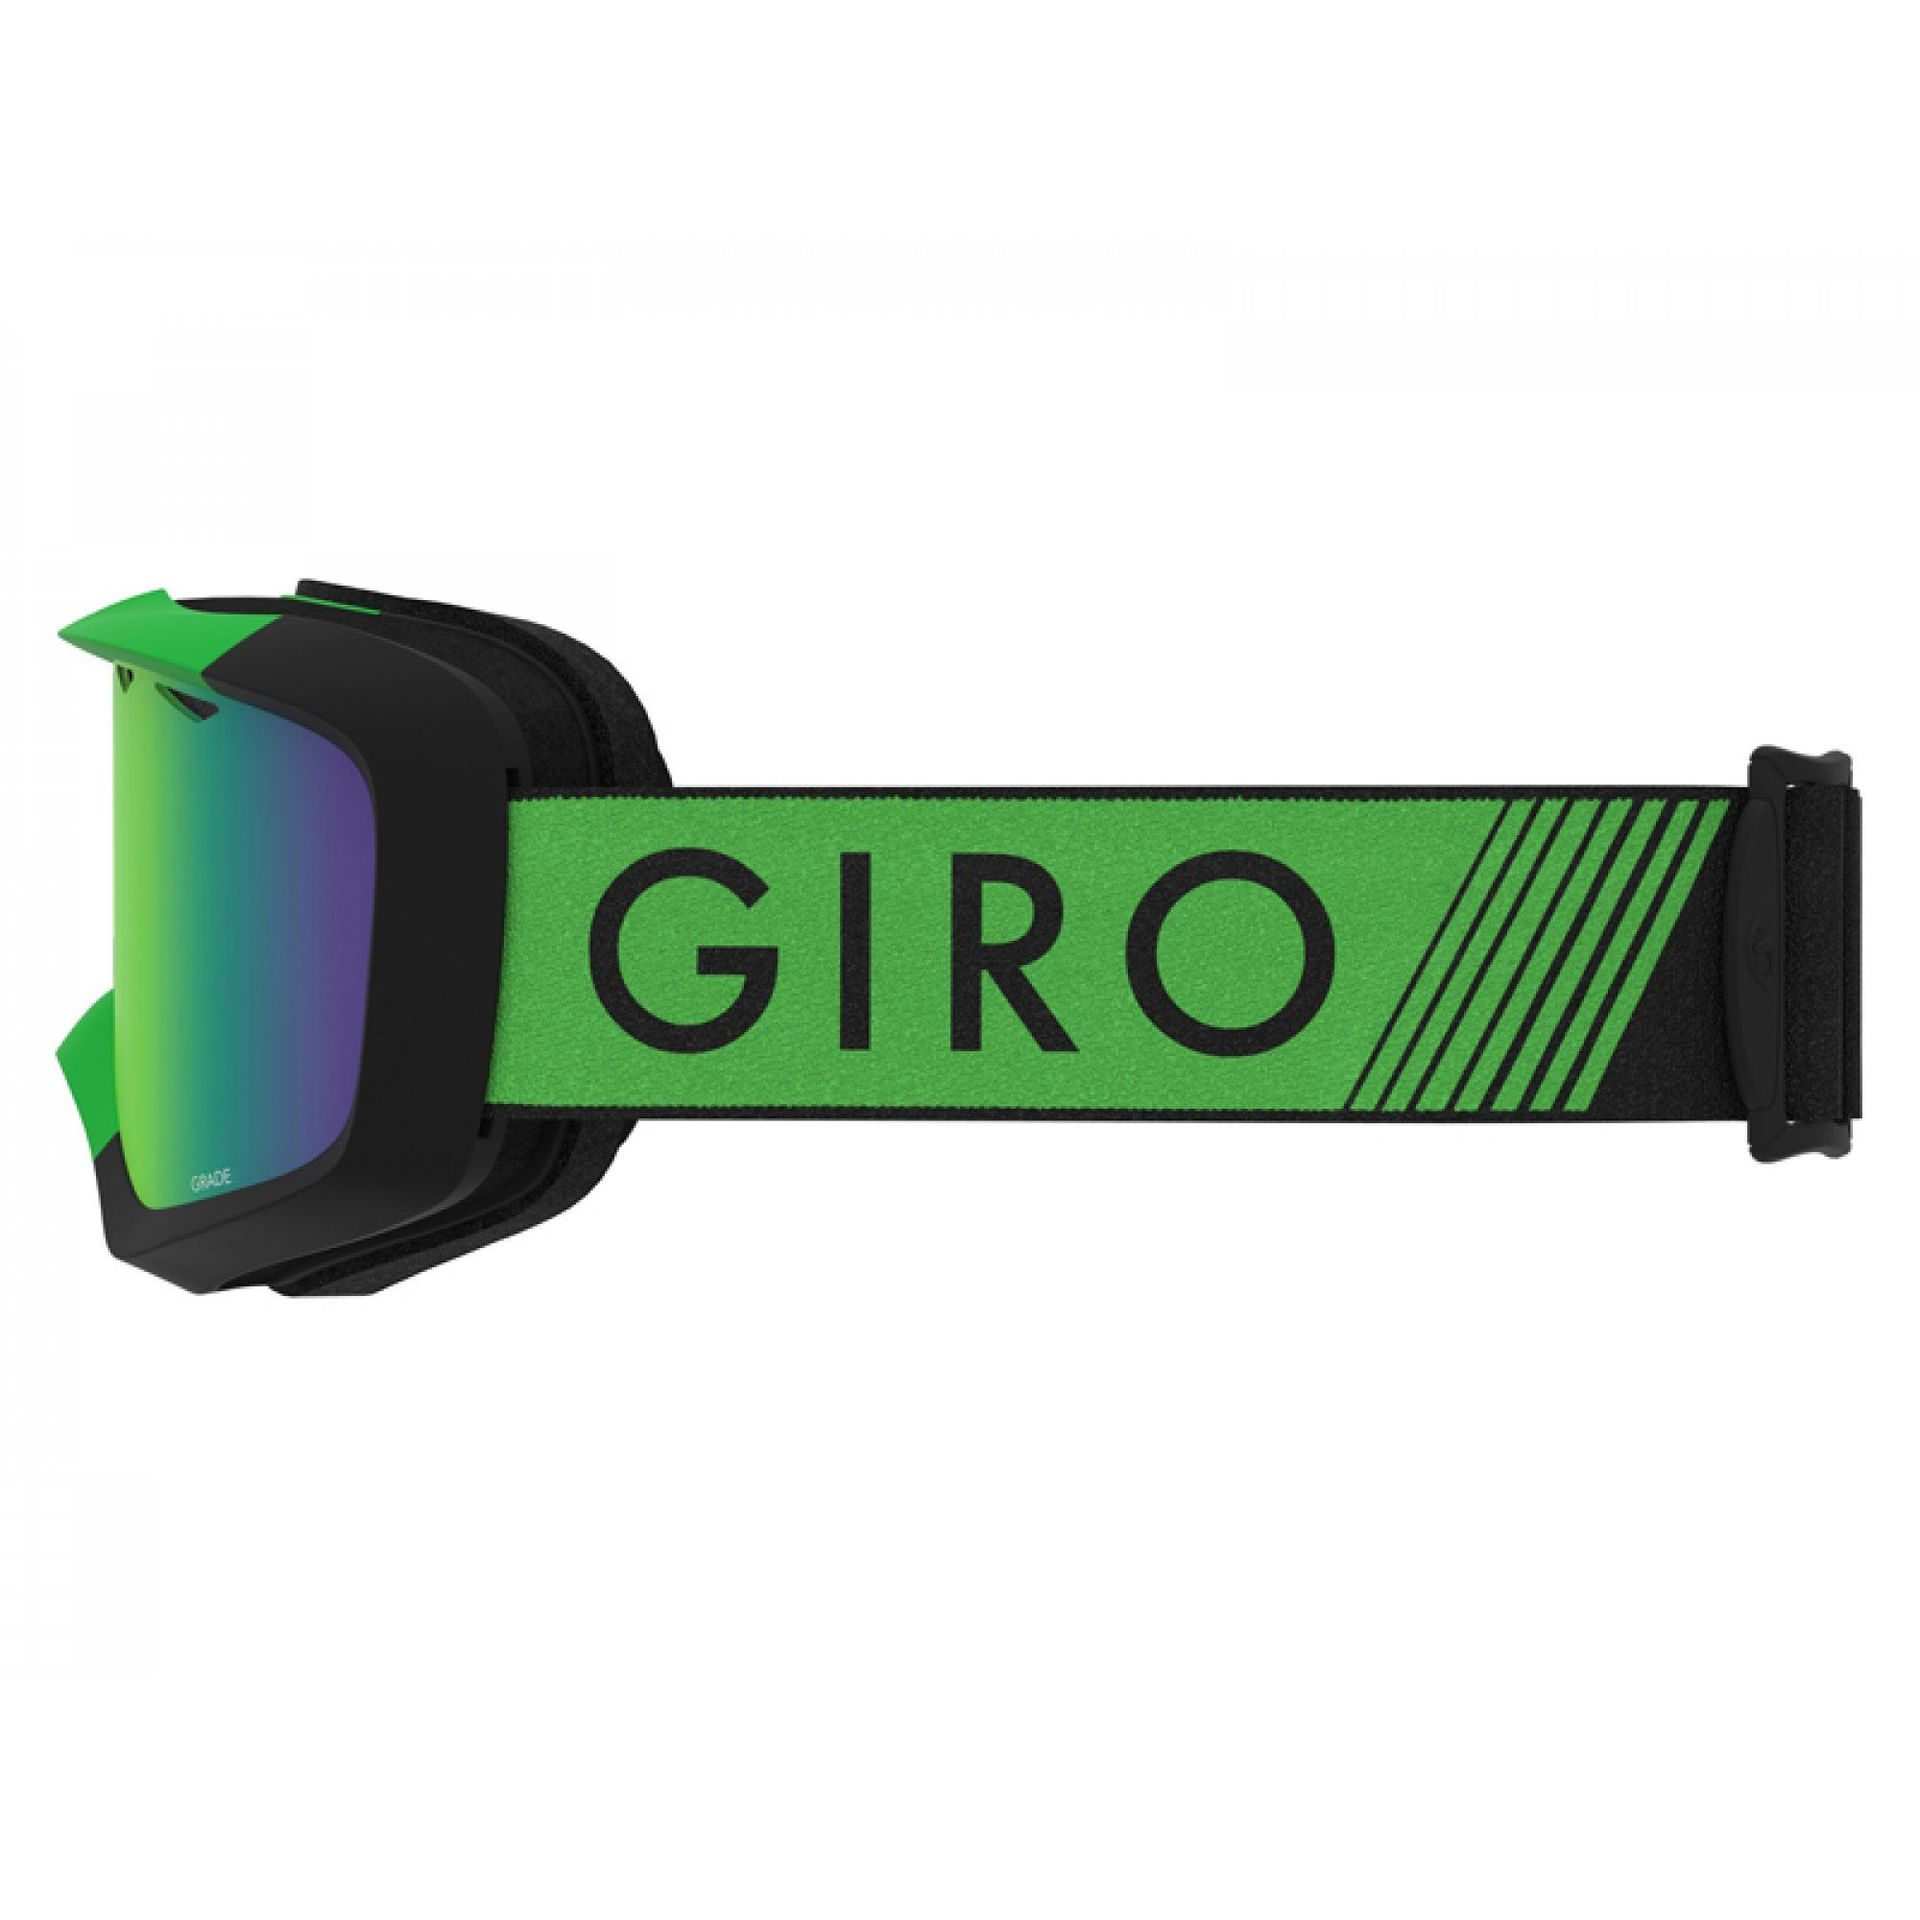 GOGLE GIRO GRADE BRIGHT GREEN BLACK ZOOM|LODEN GREEN 3